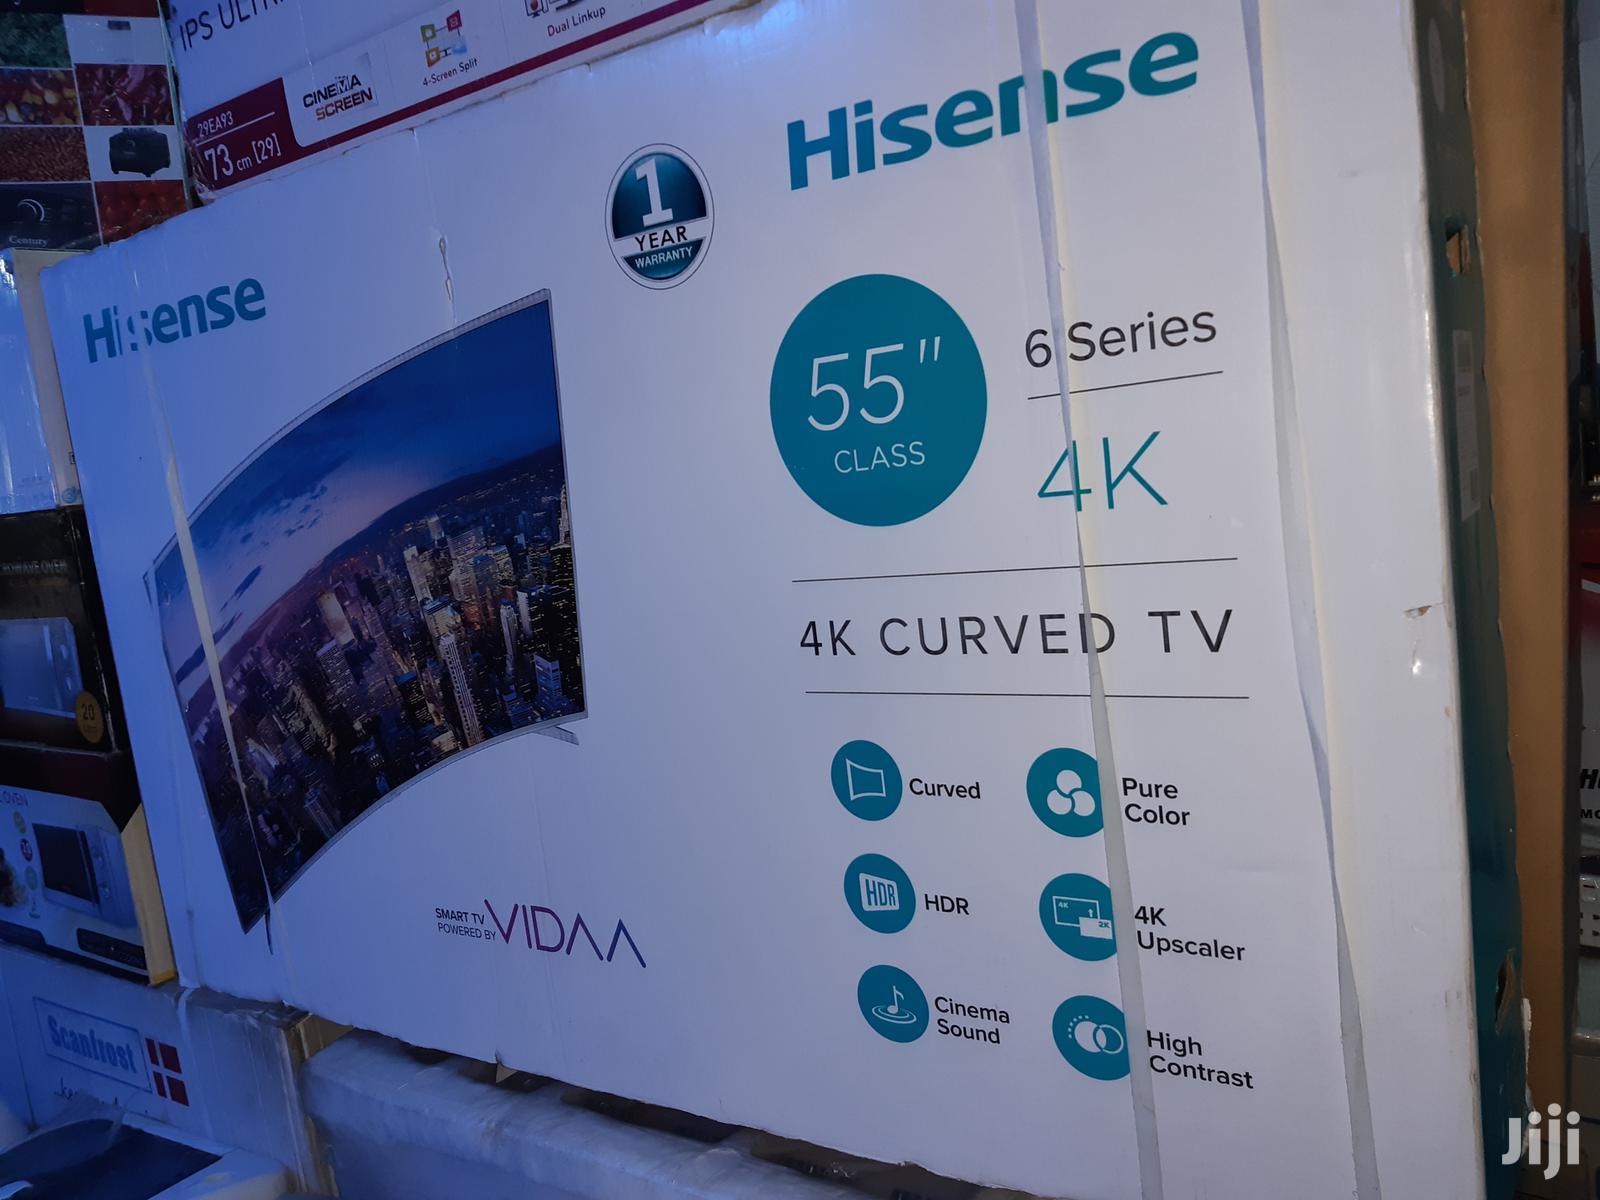 Hisense Culv Led (4K Uhd) (Youtube) TV 55 Inches